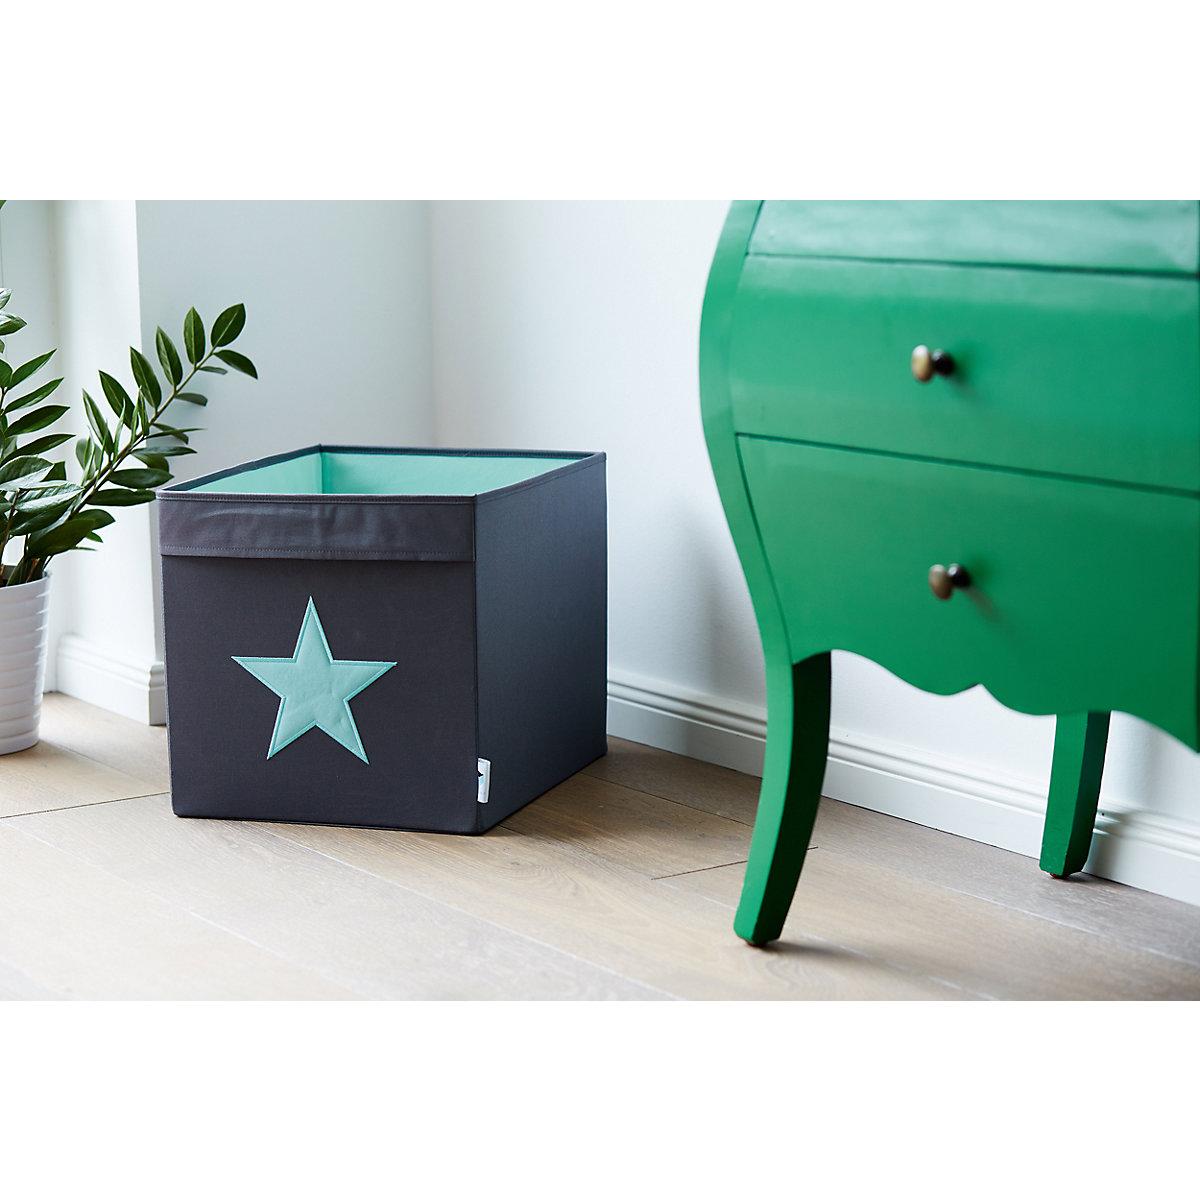 aufbewahrungsbox stern grau mint grau store it yomonda. Black Bedroom Furniture Sets. Home Design Ideas